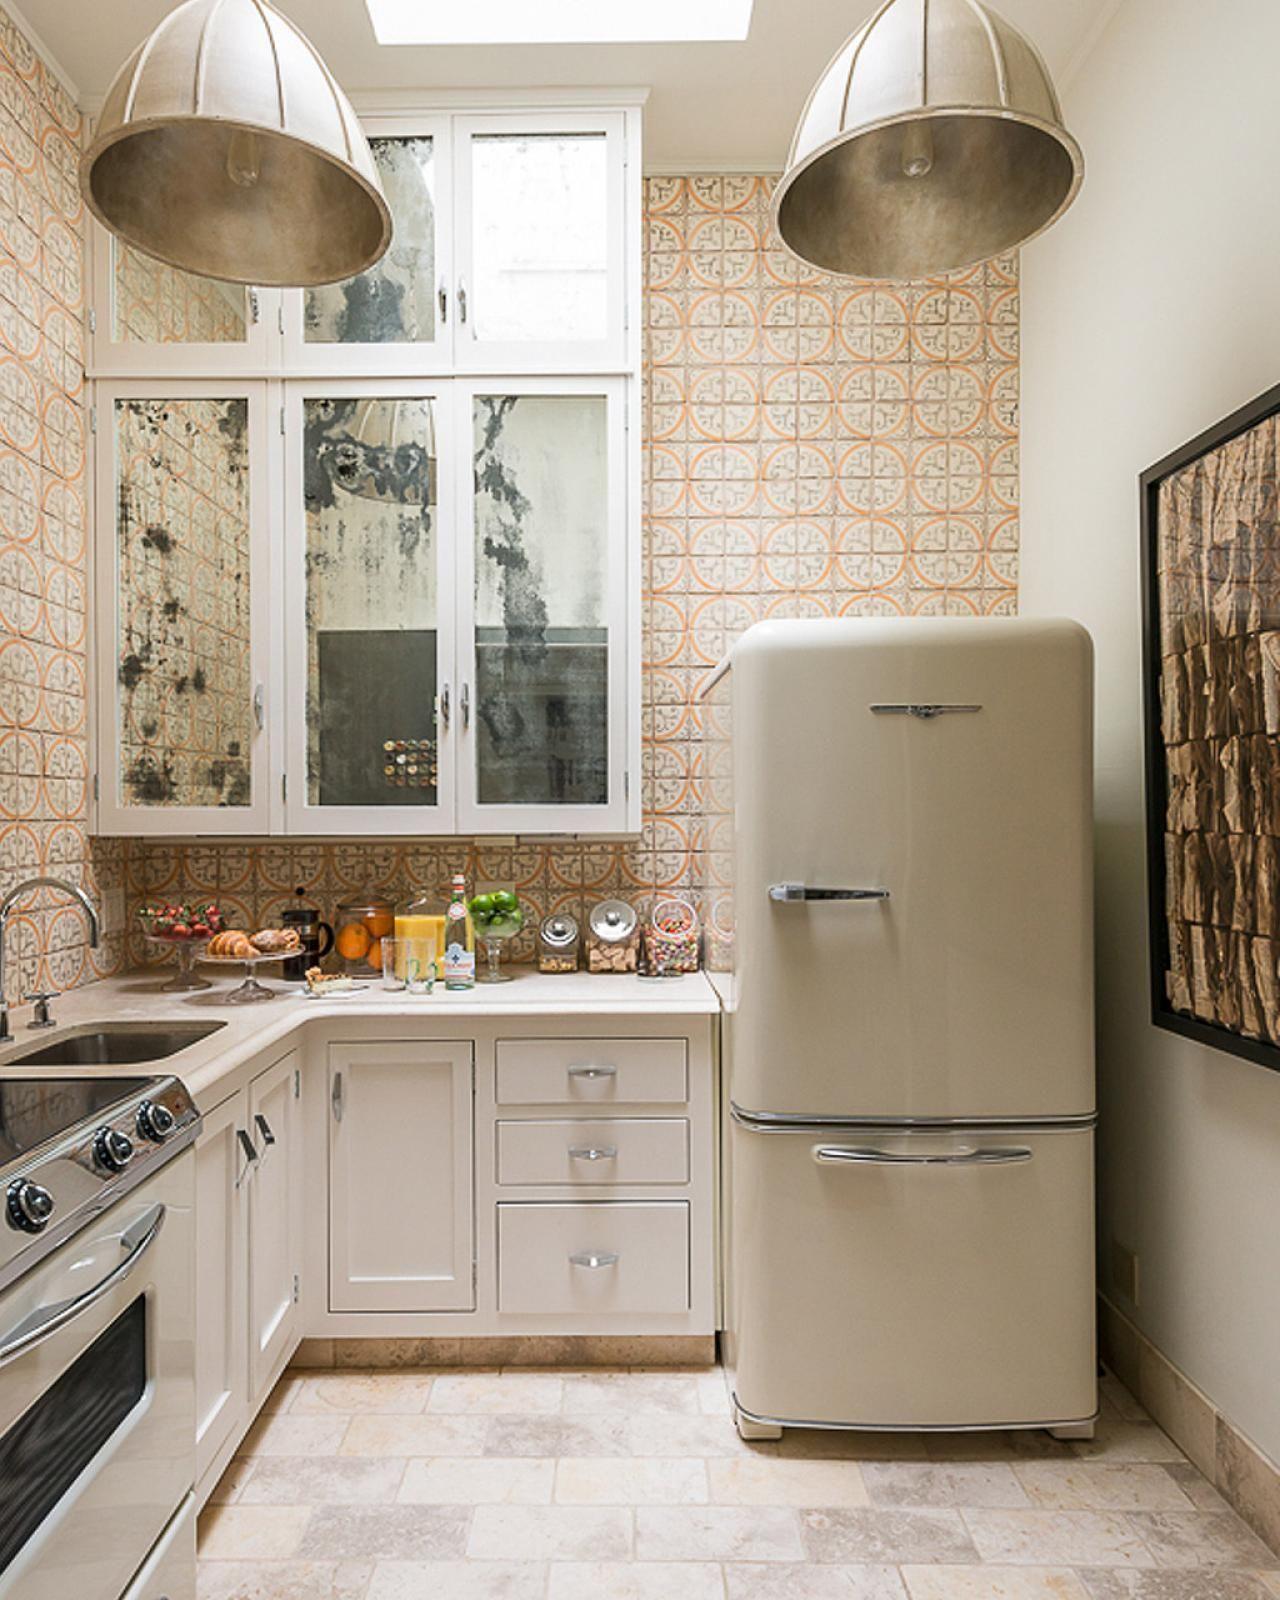 Tiny Homes That Are Big On Storage Tiny Kitchen Small Kitchen